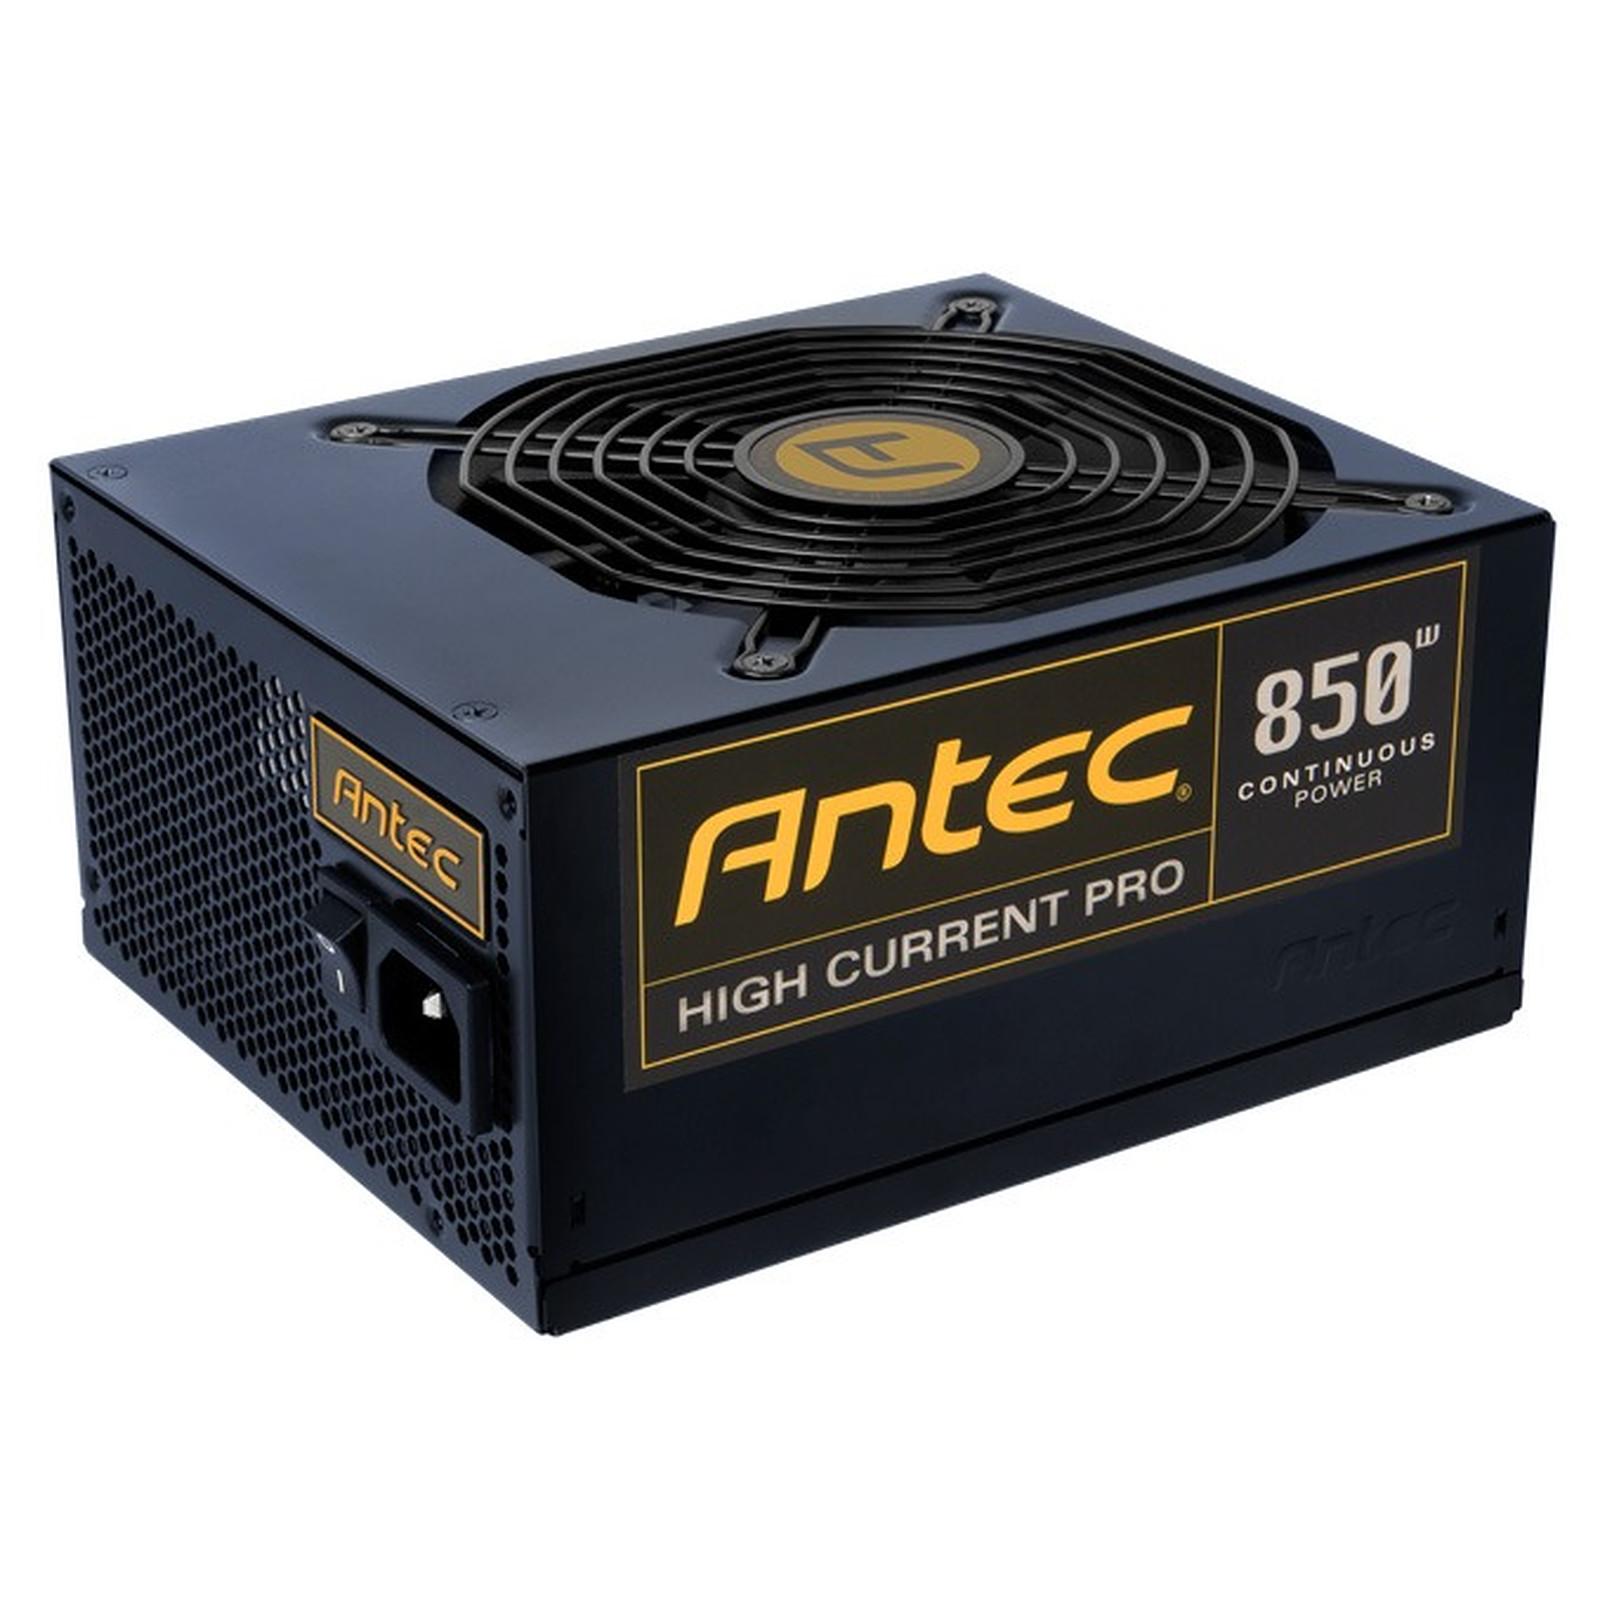 Antec High Current Pro 850 80PLUS Gold